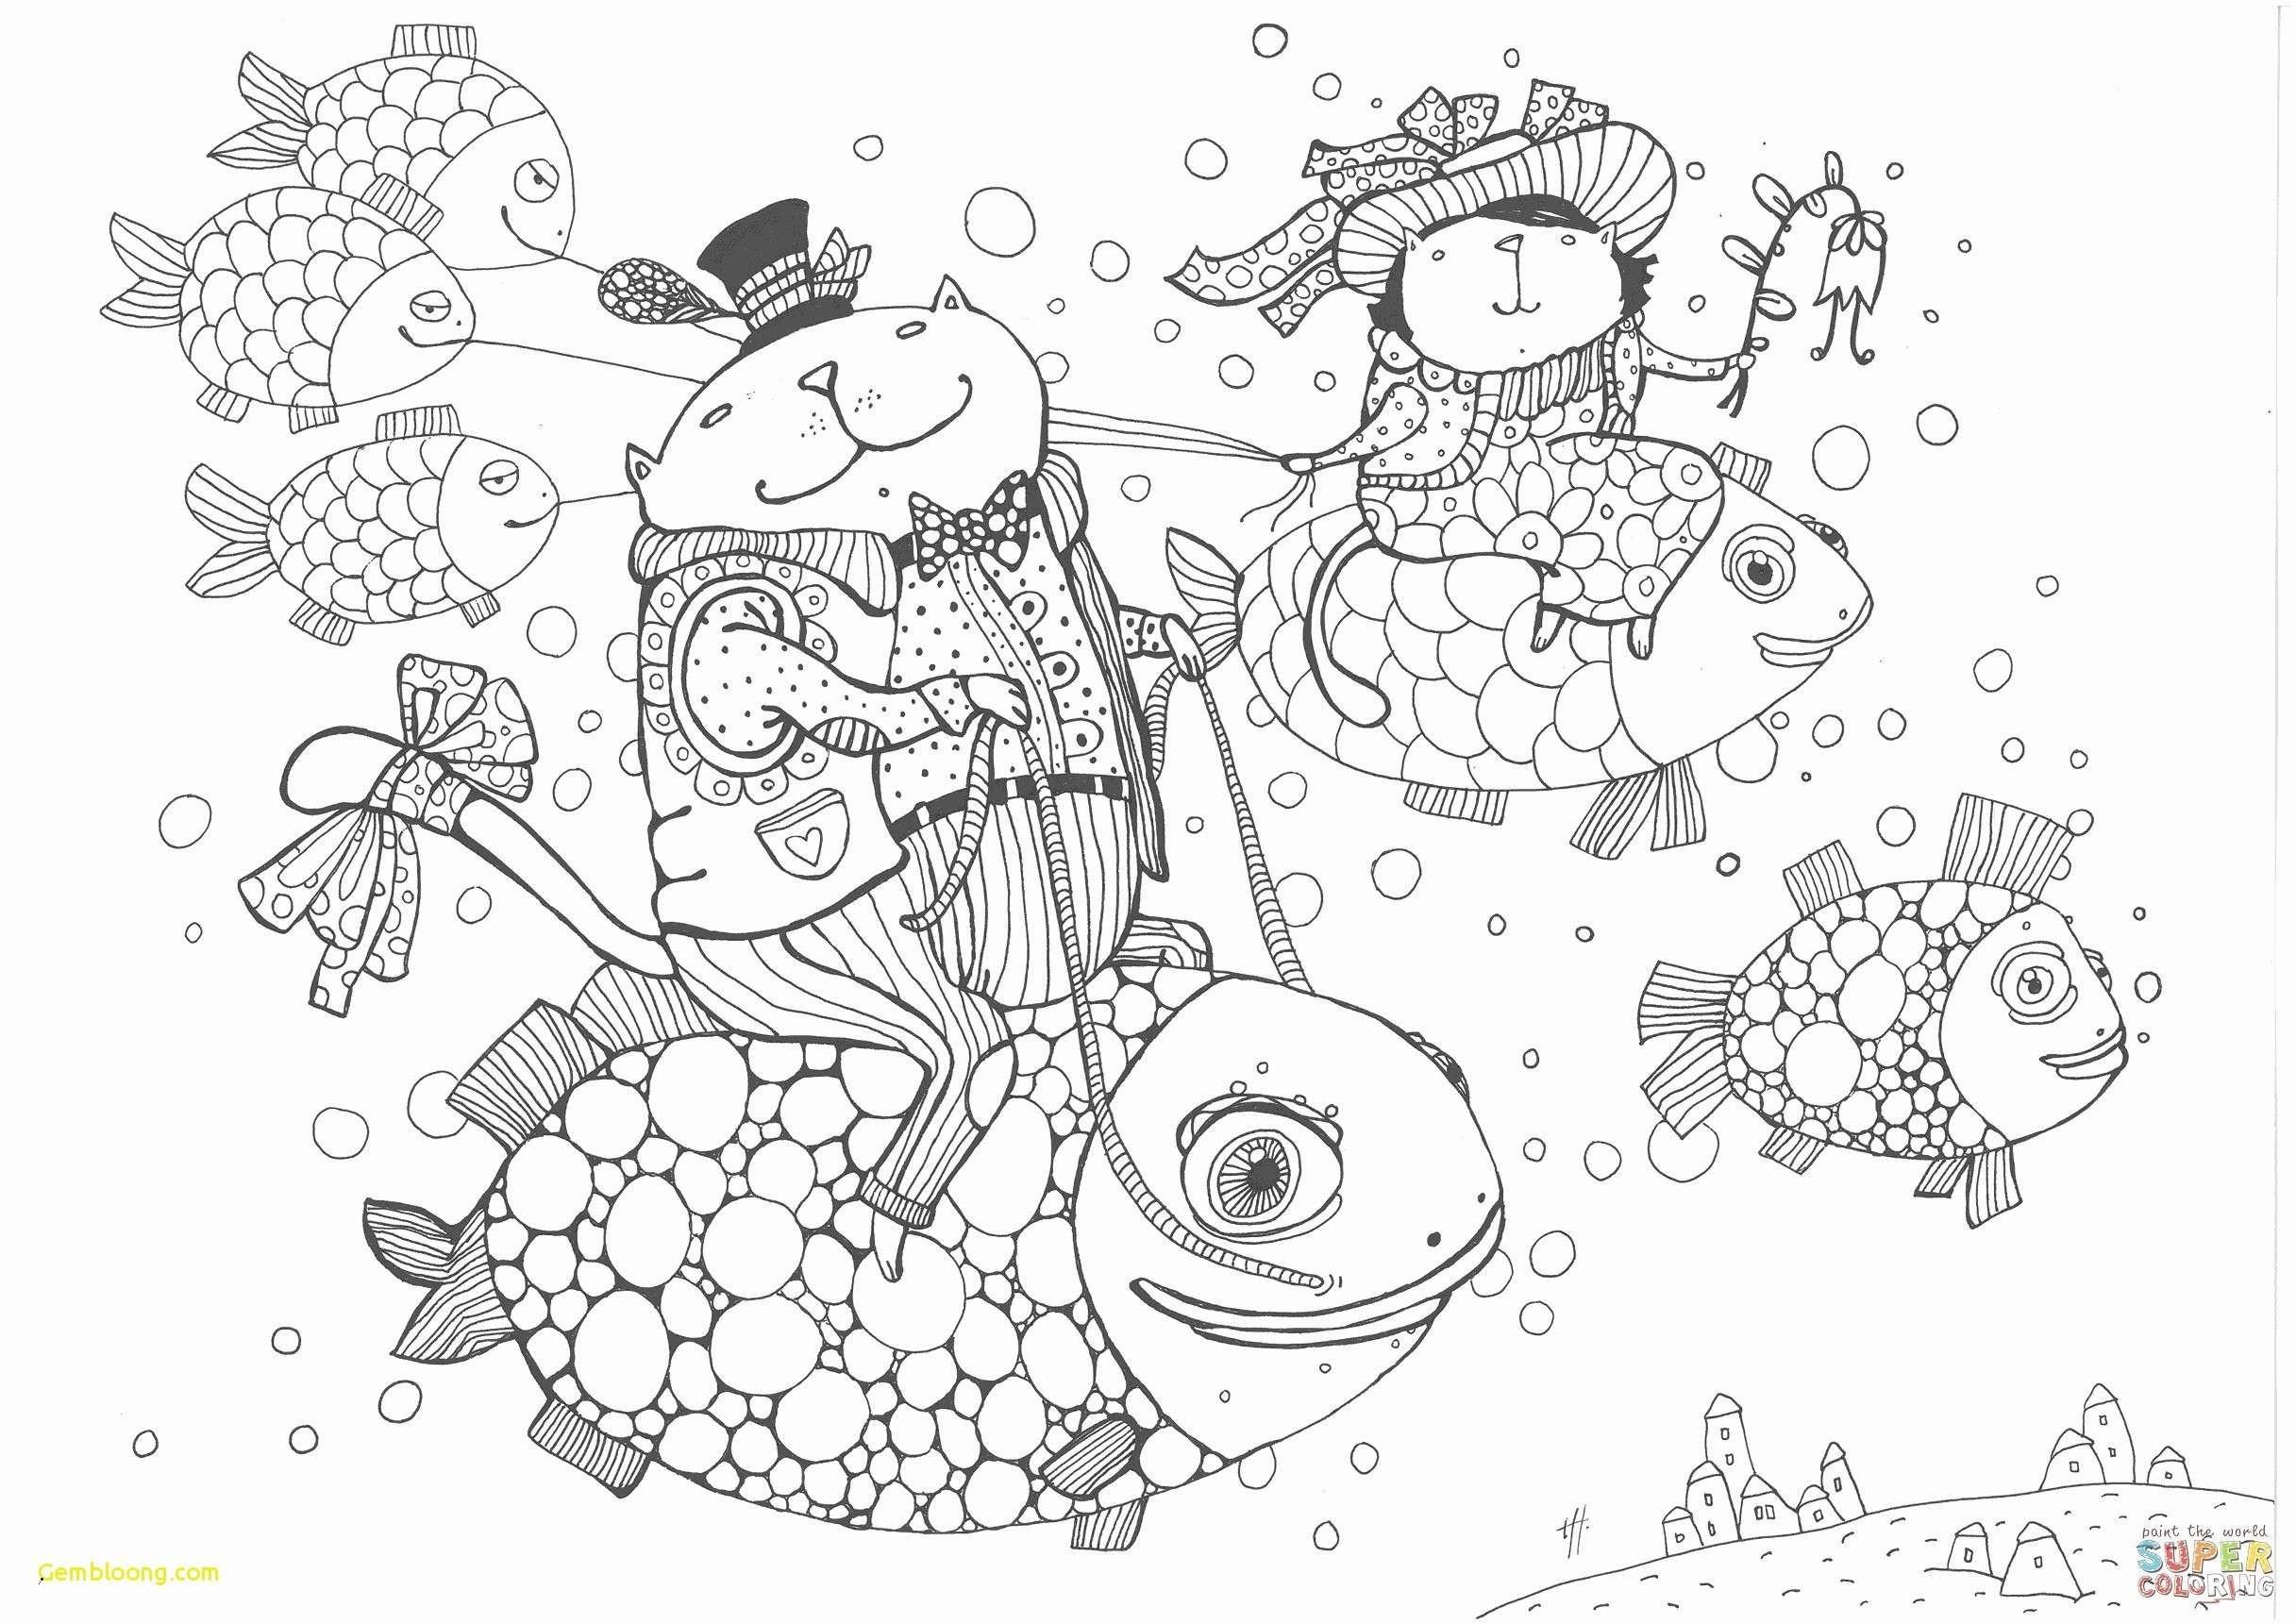 Mandala Herbst Zum Ausdrucken Neu 40 formular Ausmalbilder Mandala Tiere Treehouse Nyc Bild